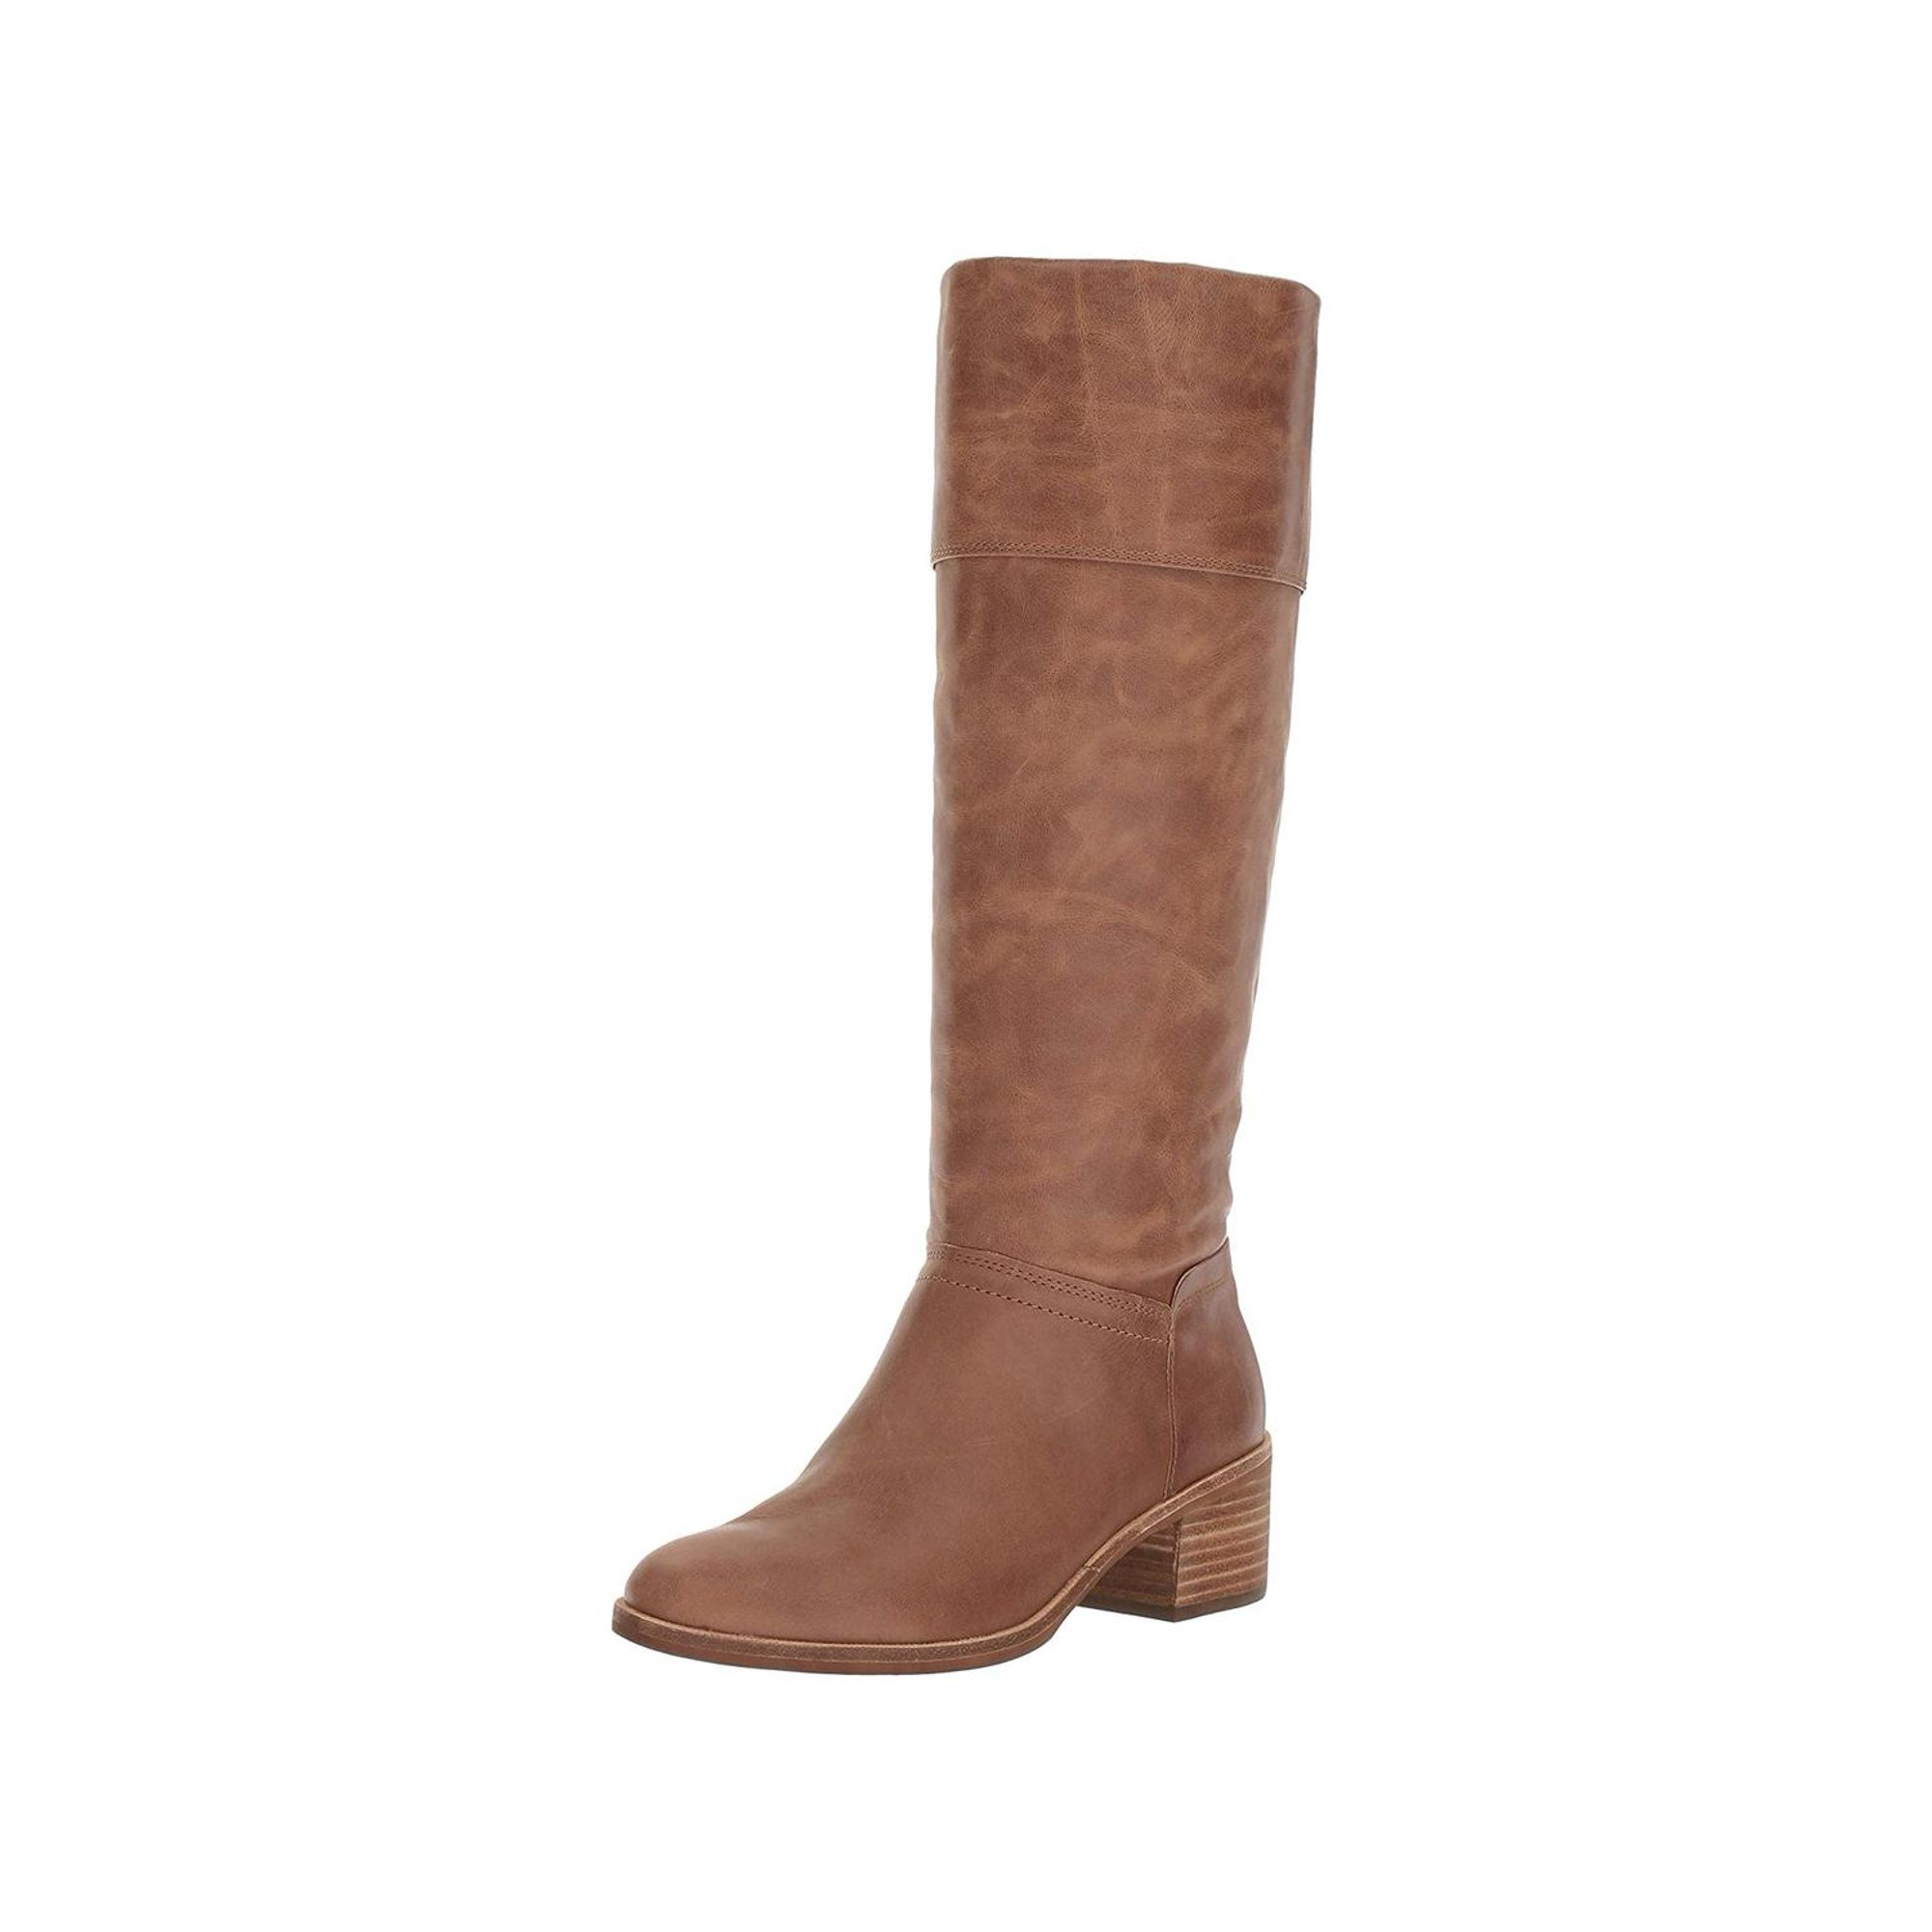 c173368fa5b Ugg Australia Womens carlin Closed Toe Knee High Fashion Boots ...